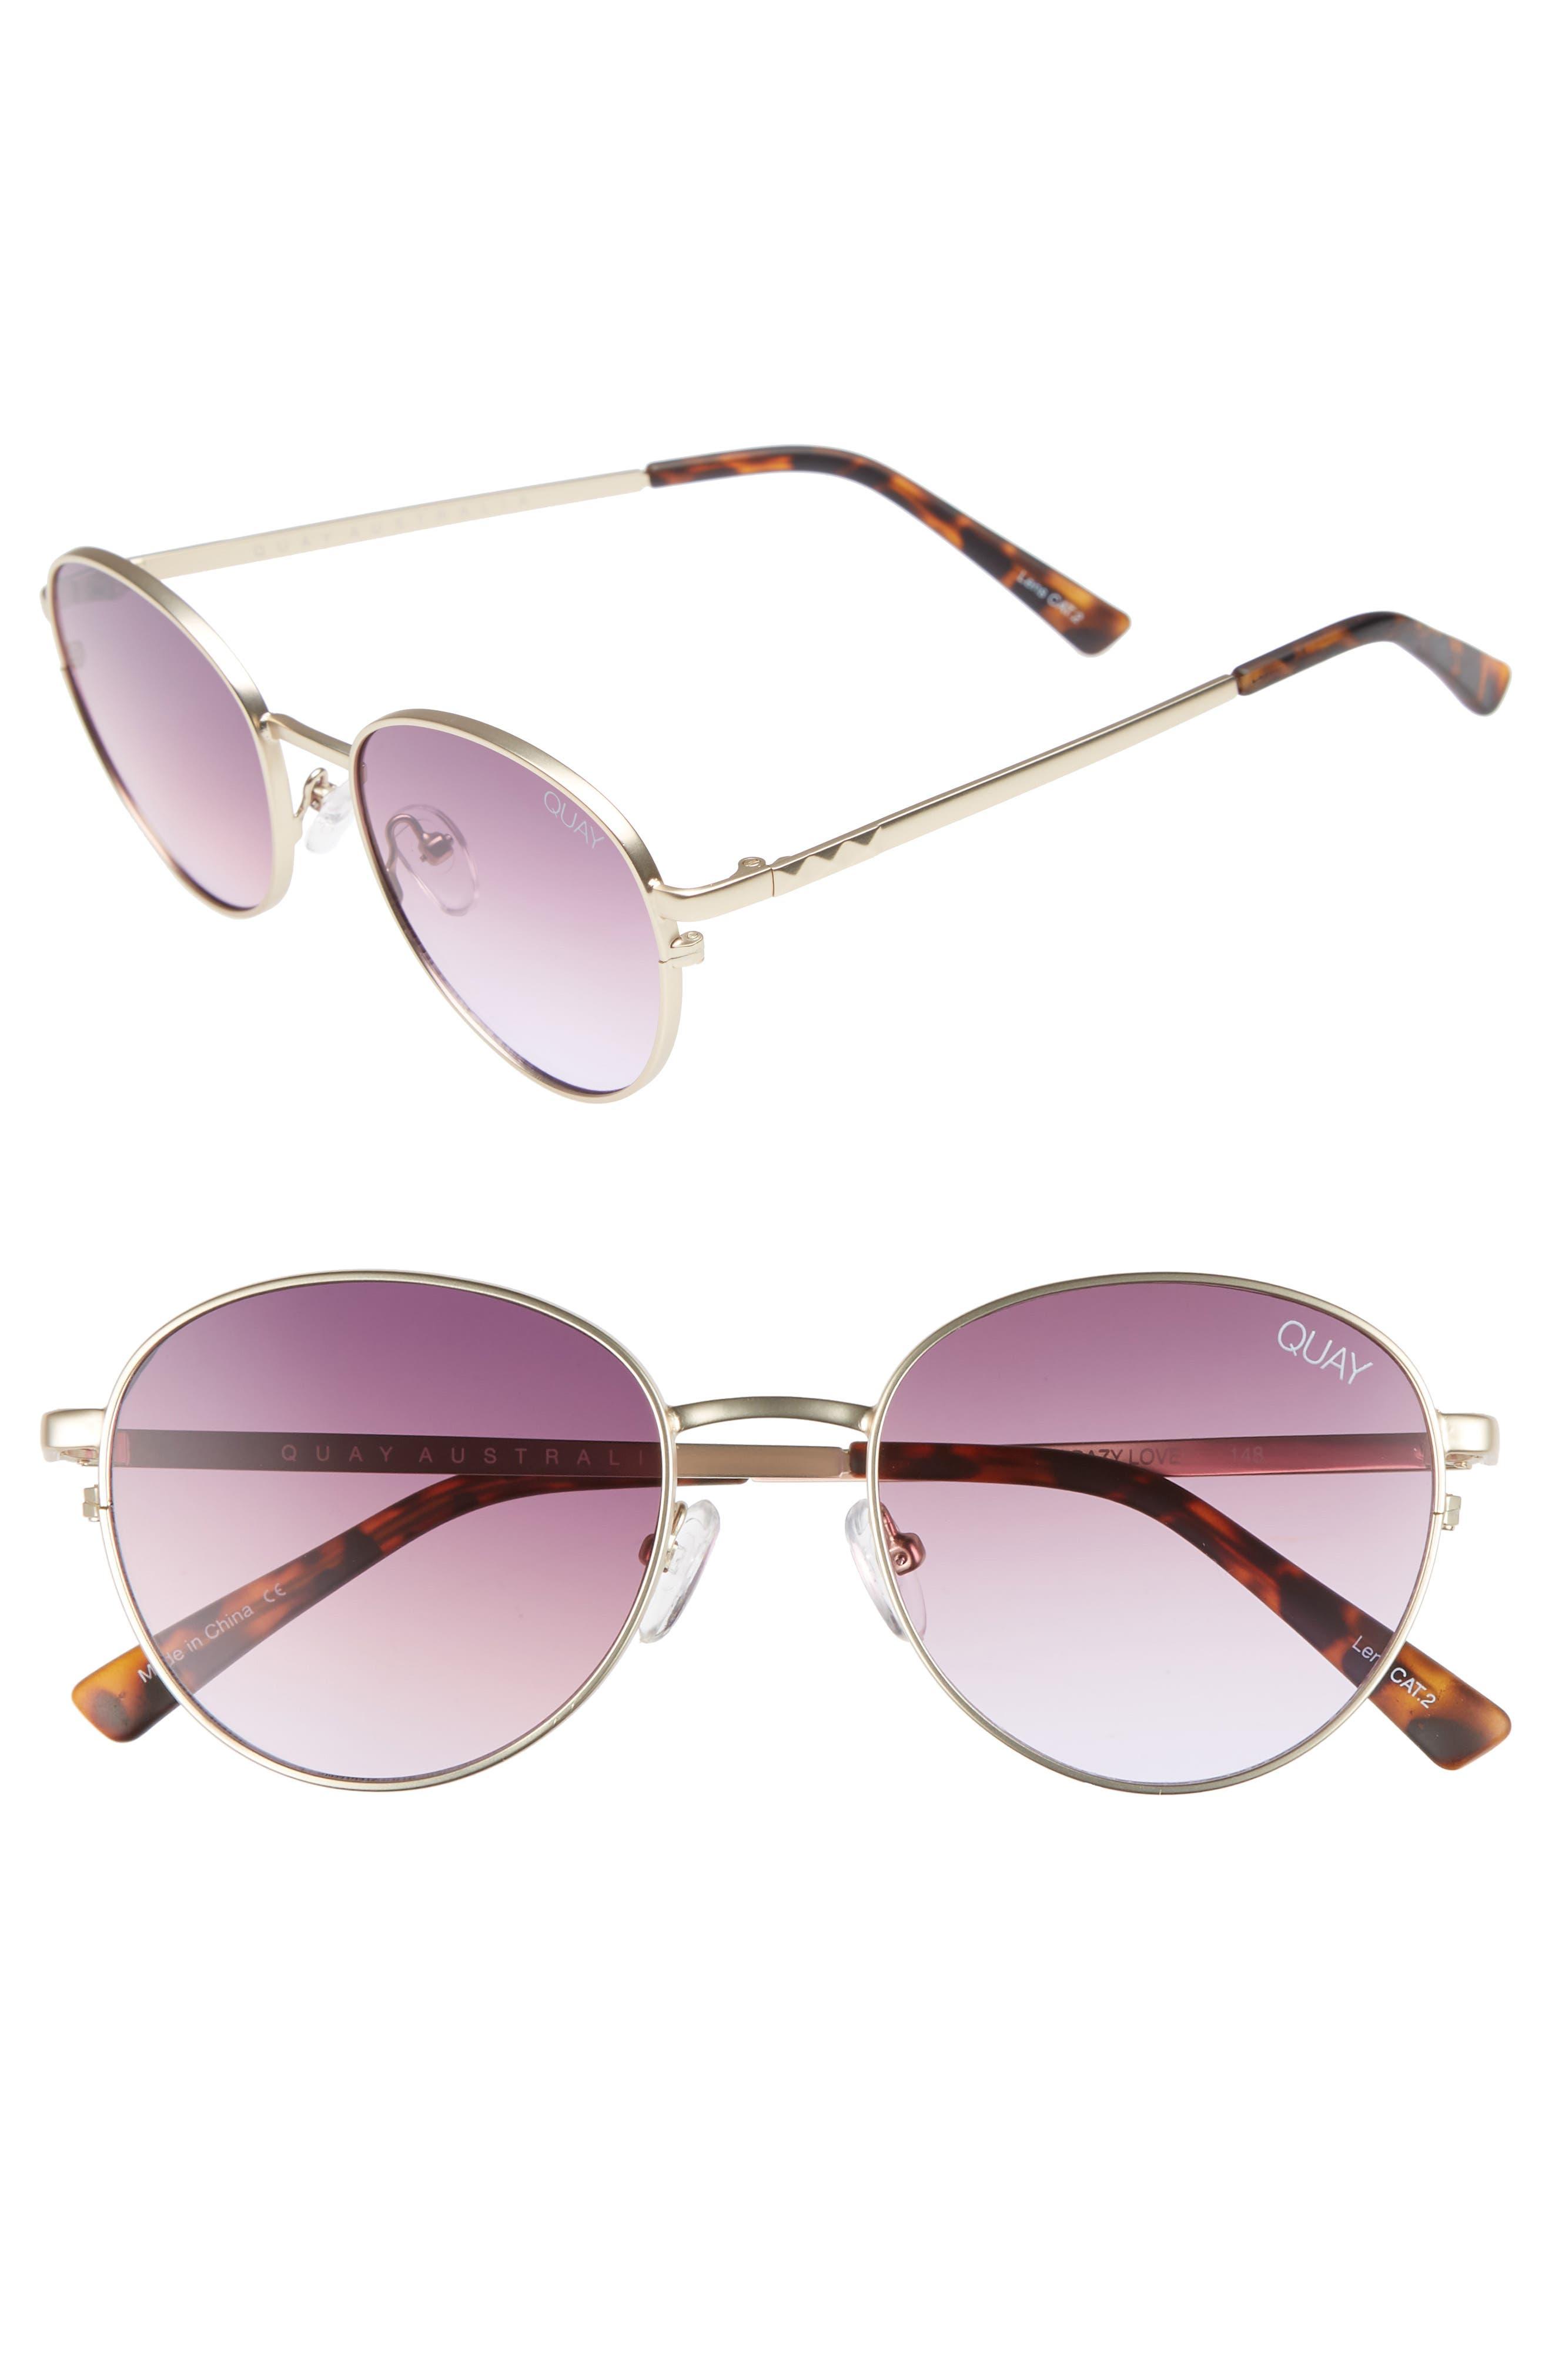 Quay Australia Crazy Love 45Mm Round Sunglasses - Gold/ Purple